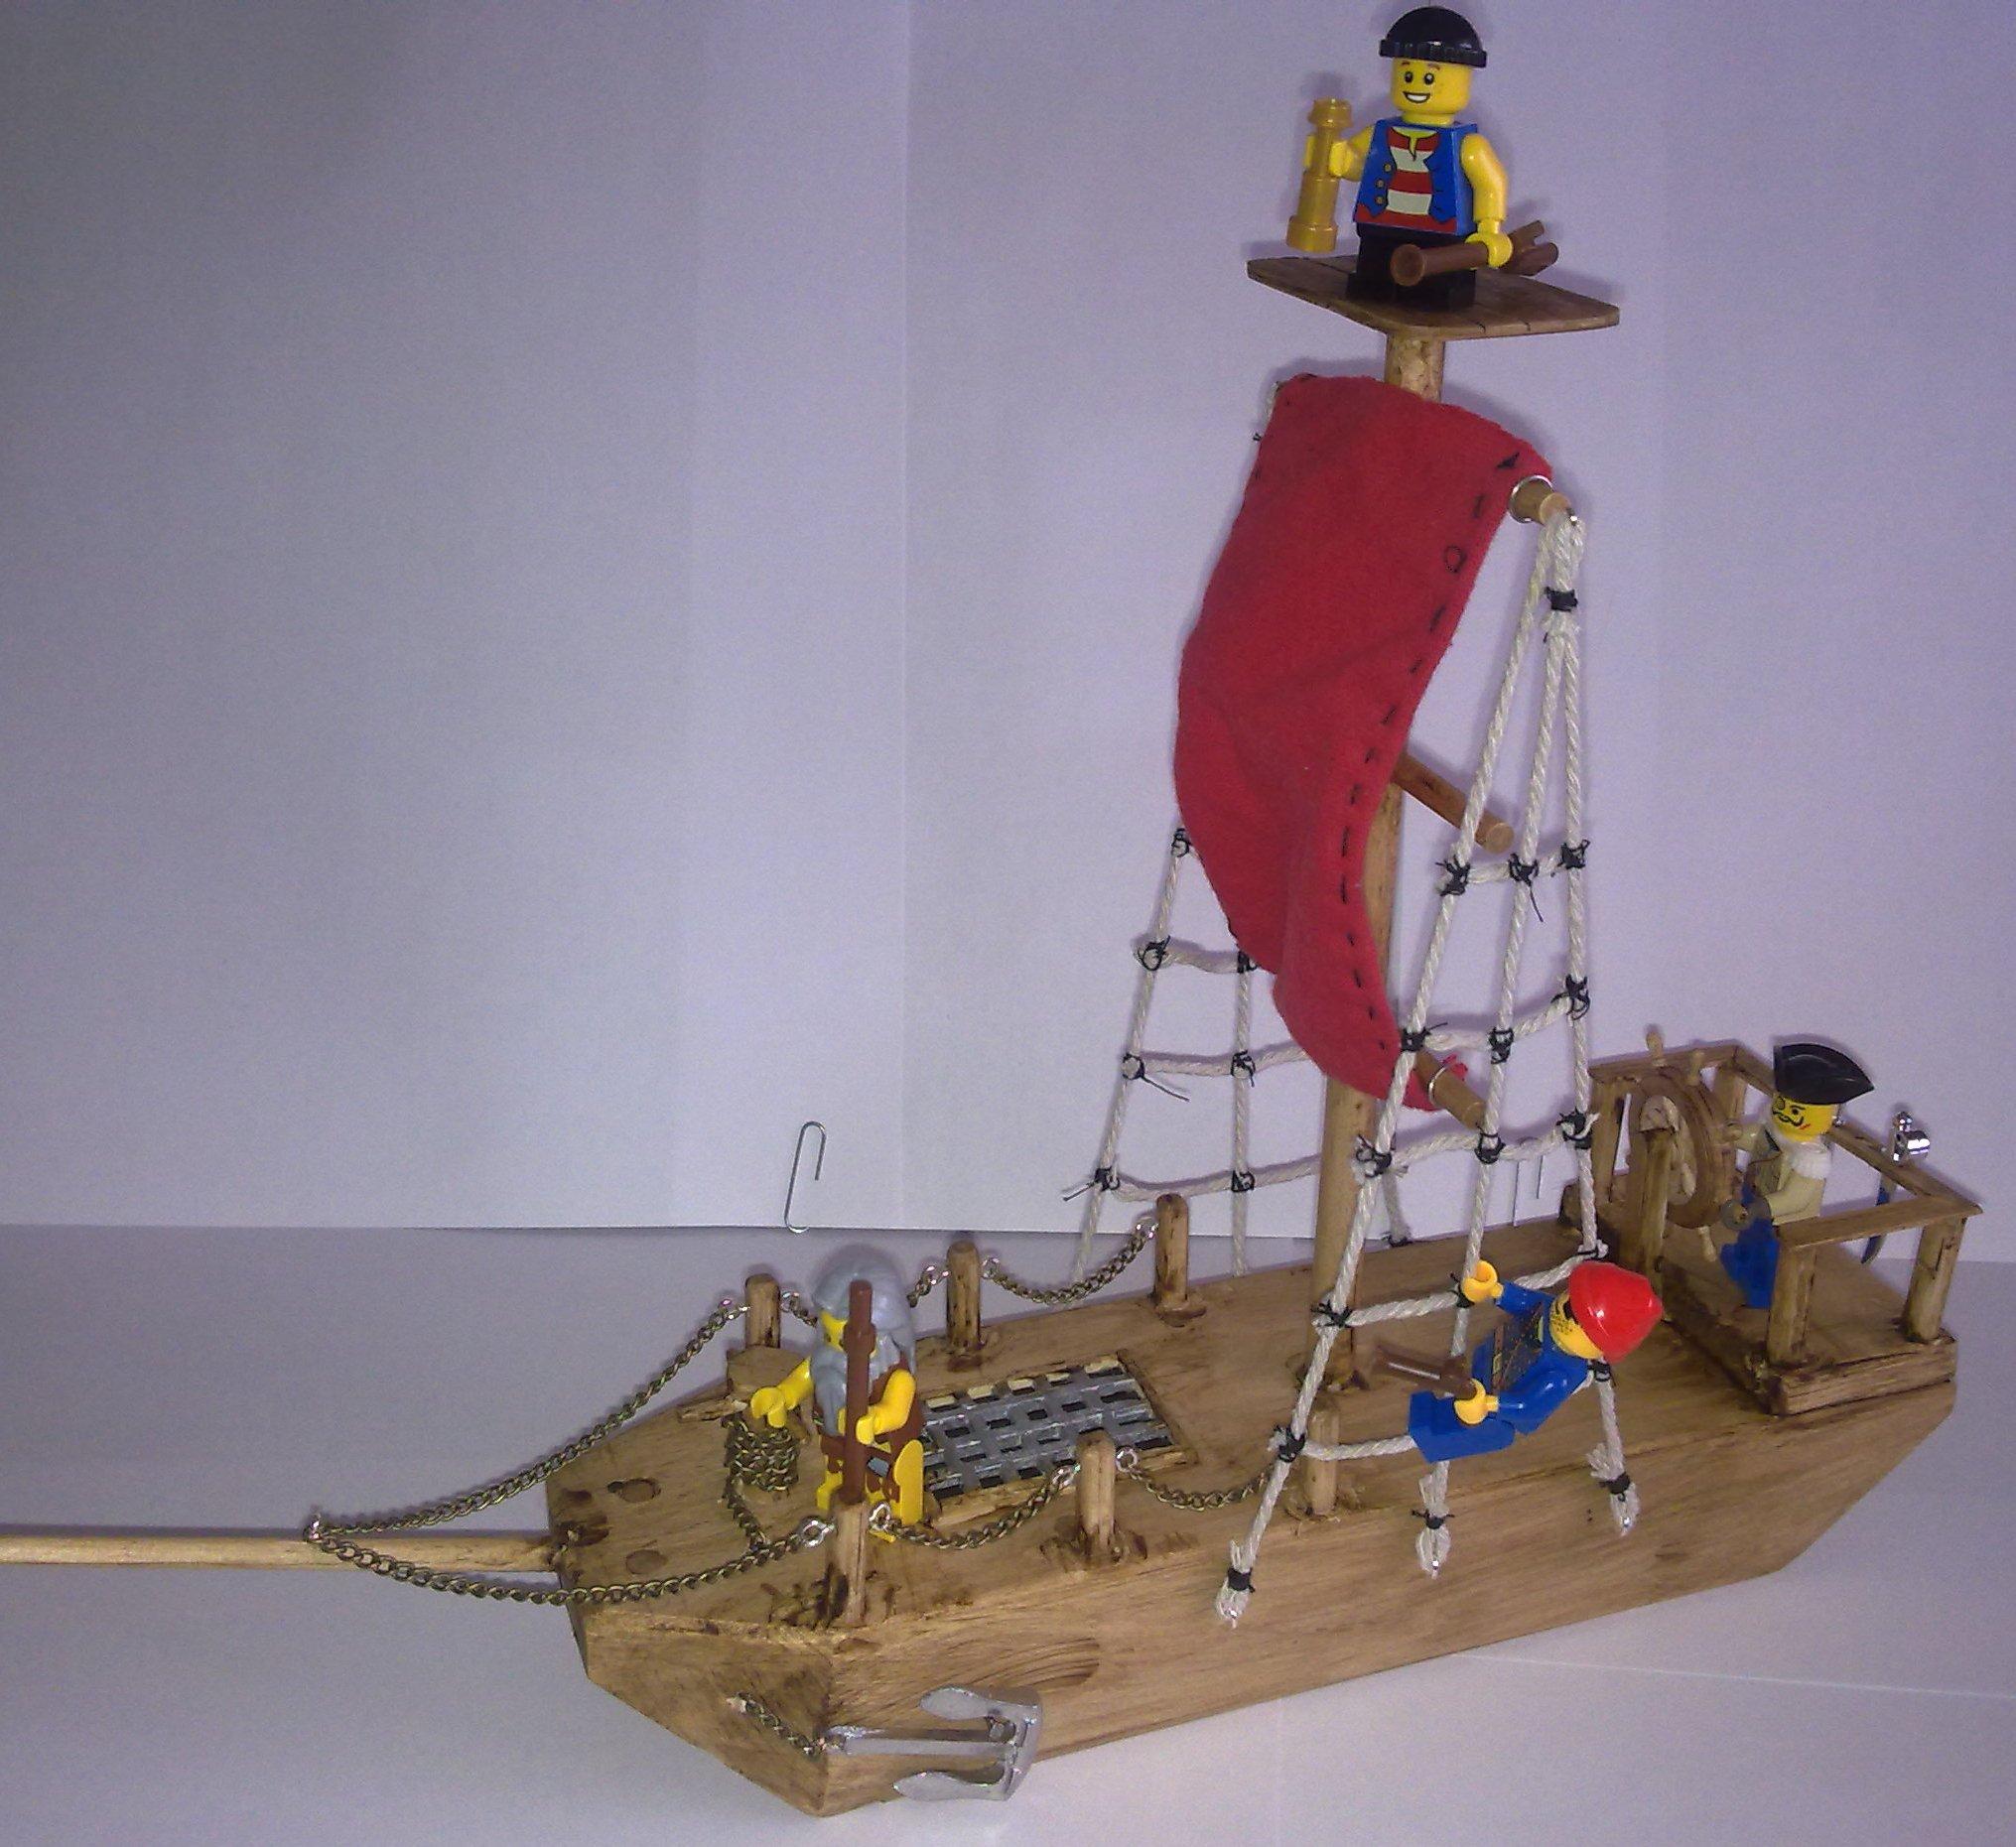 Pirate Ship Modification